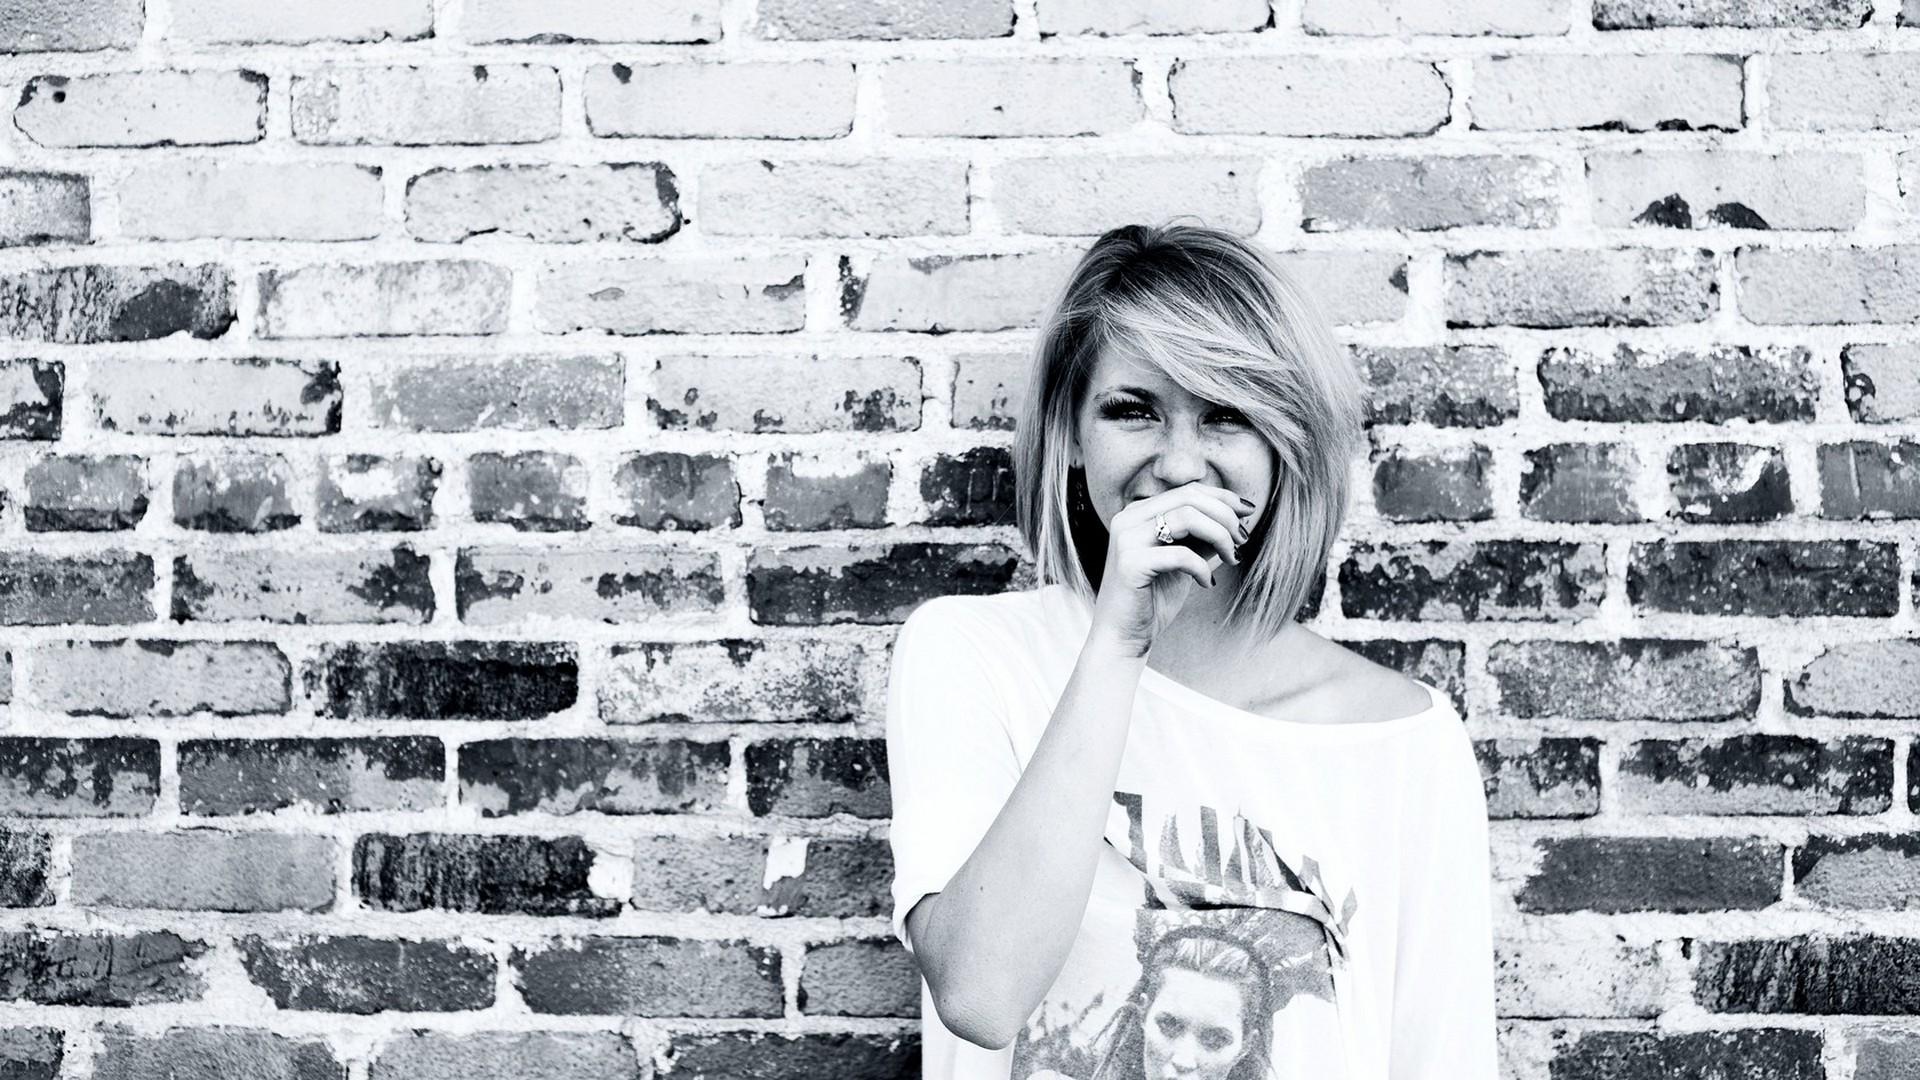 White Black Women Monochrome Blonde Sitting Wall Photography Smiling Shirt Emotion Ellie Goulding Brick Photograph 1920x1080